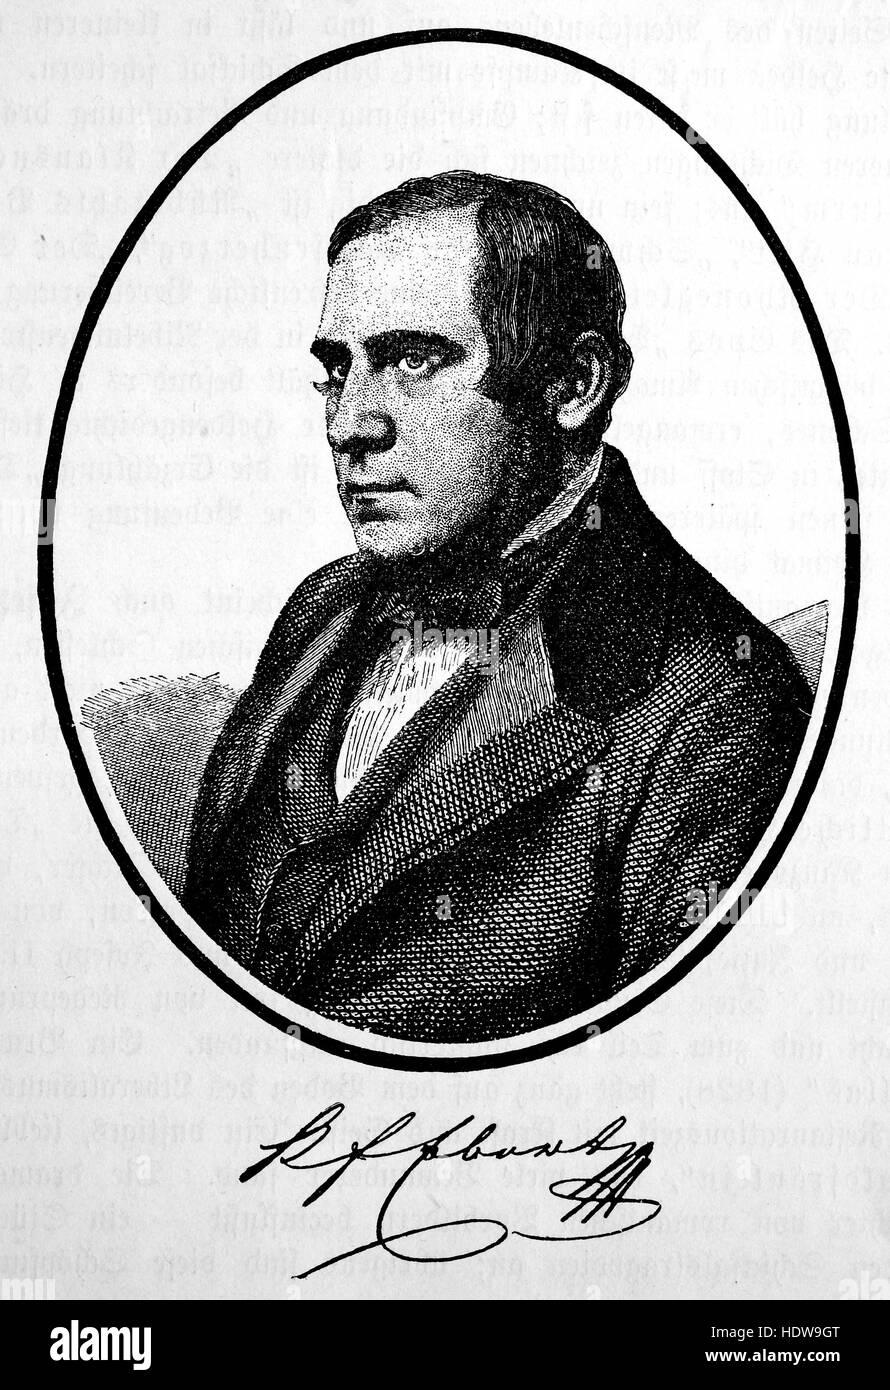 Karl Egon Ebert, 1801-1882, a Bohemian German poet, woodcut from the year 1880 - Stock Image